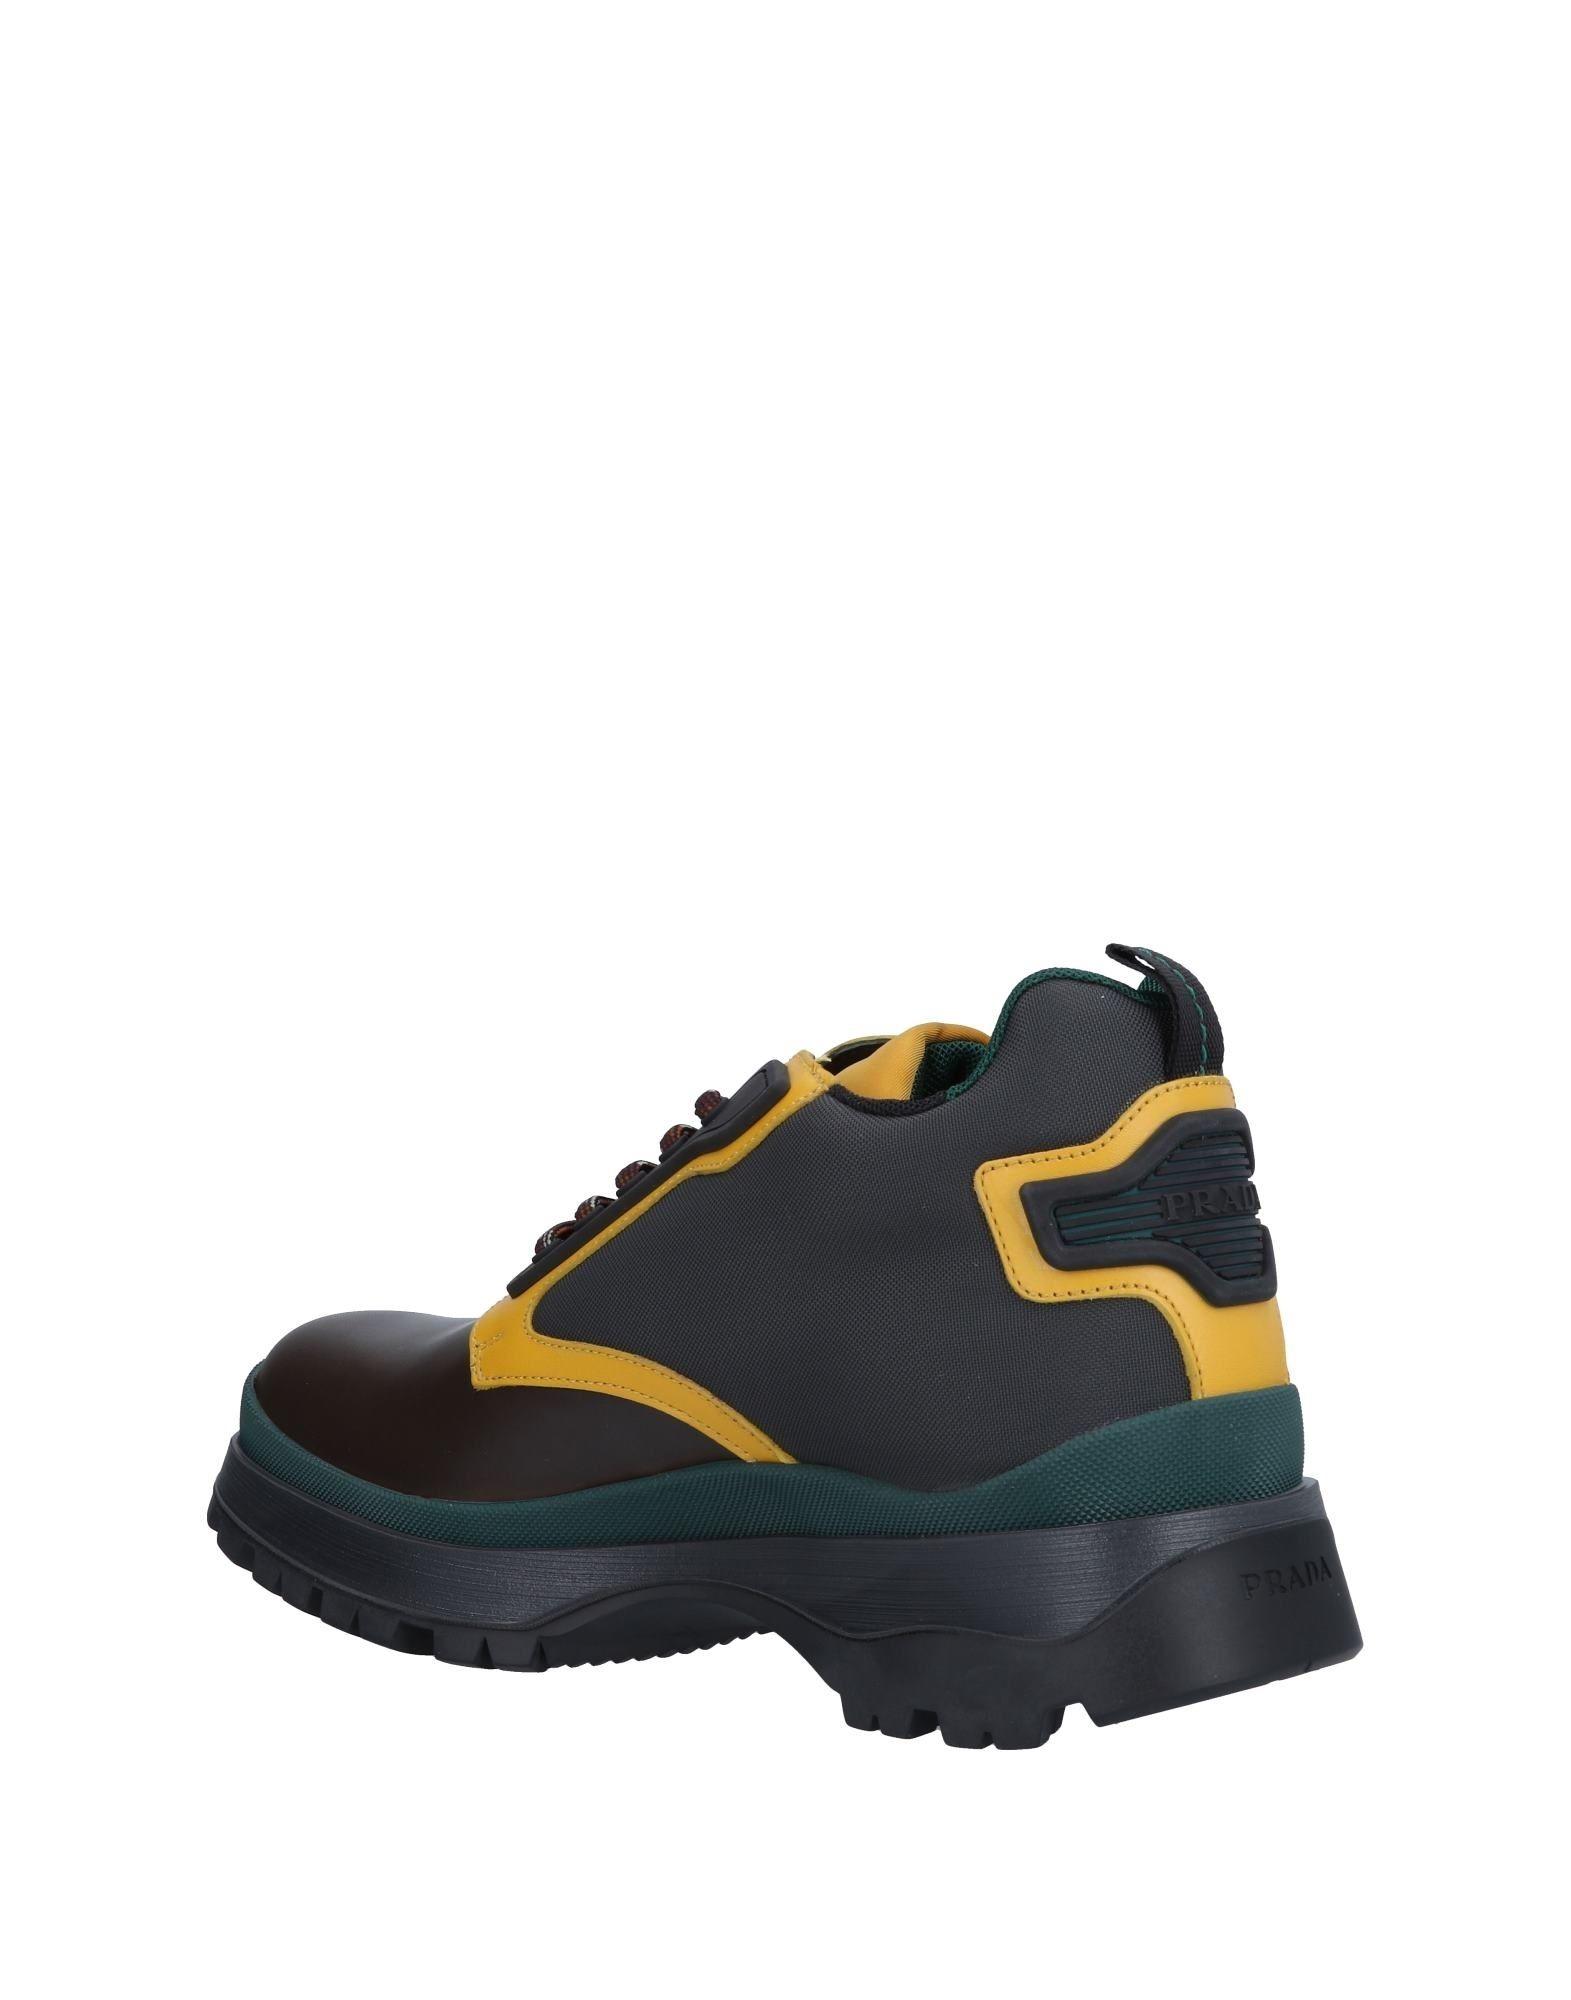 Prada Sport Sneakers Herren Herren Herren  11495652IK 7bfaab